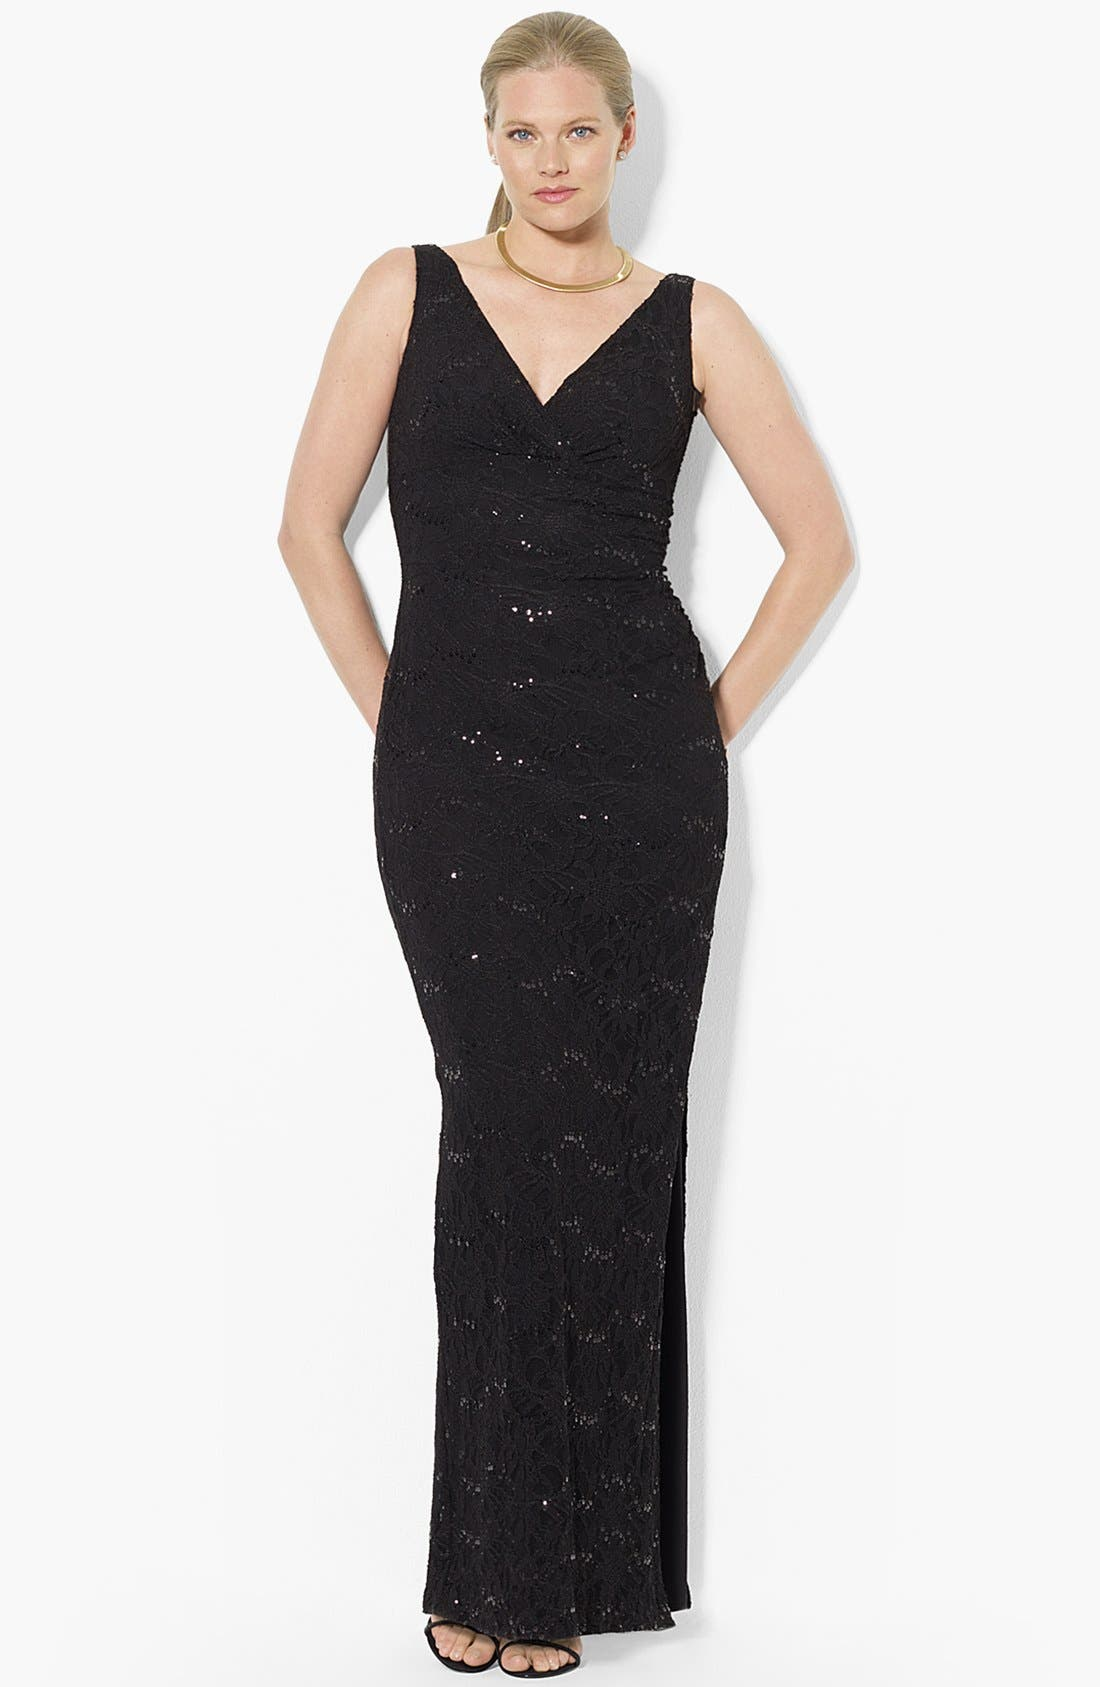 Alternate Image 1 Selected - Lauren Ralph Lauren Sequin Lace Column Gown (Plus Size)